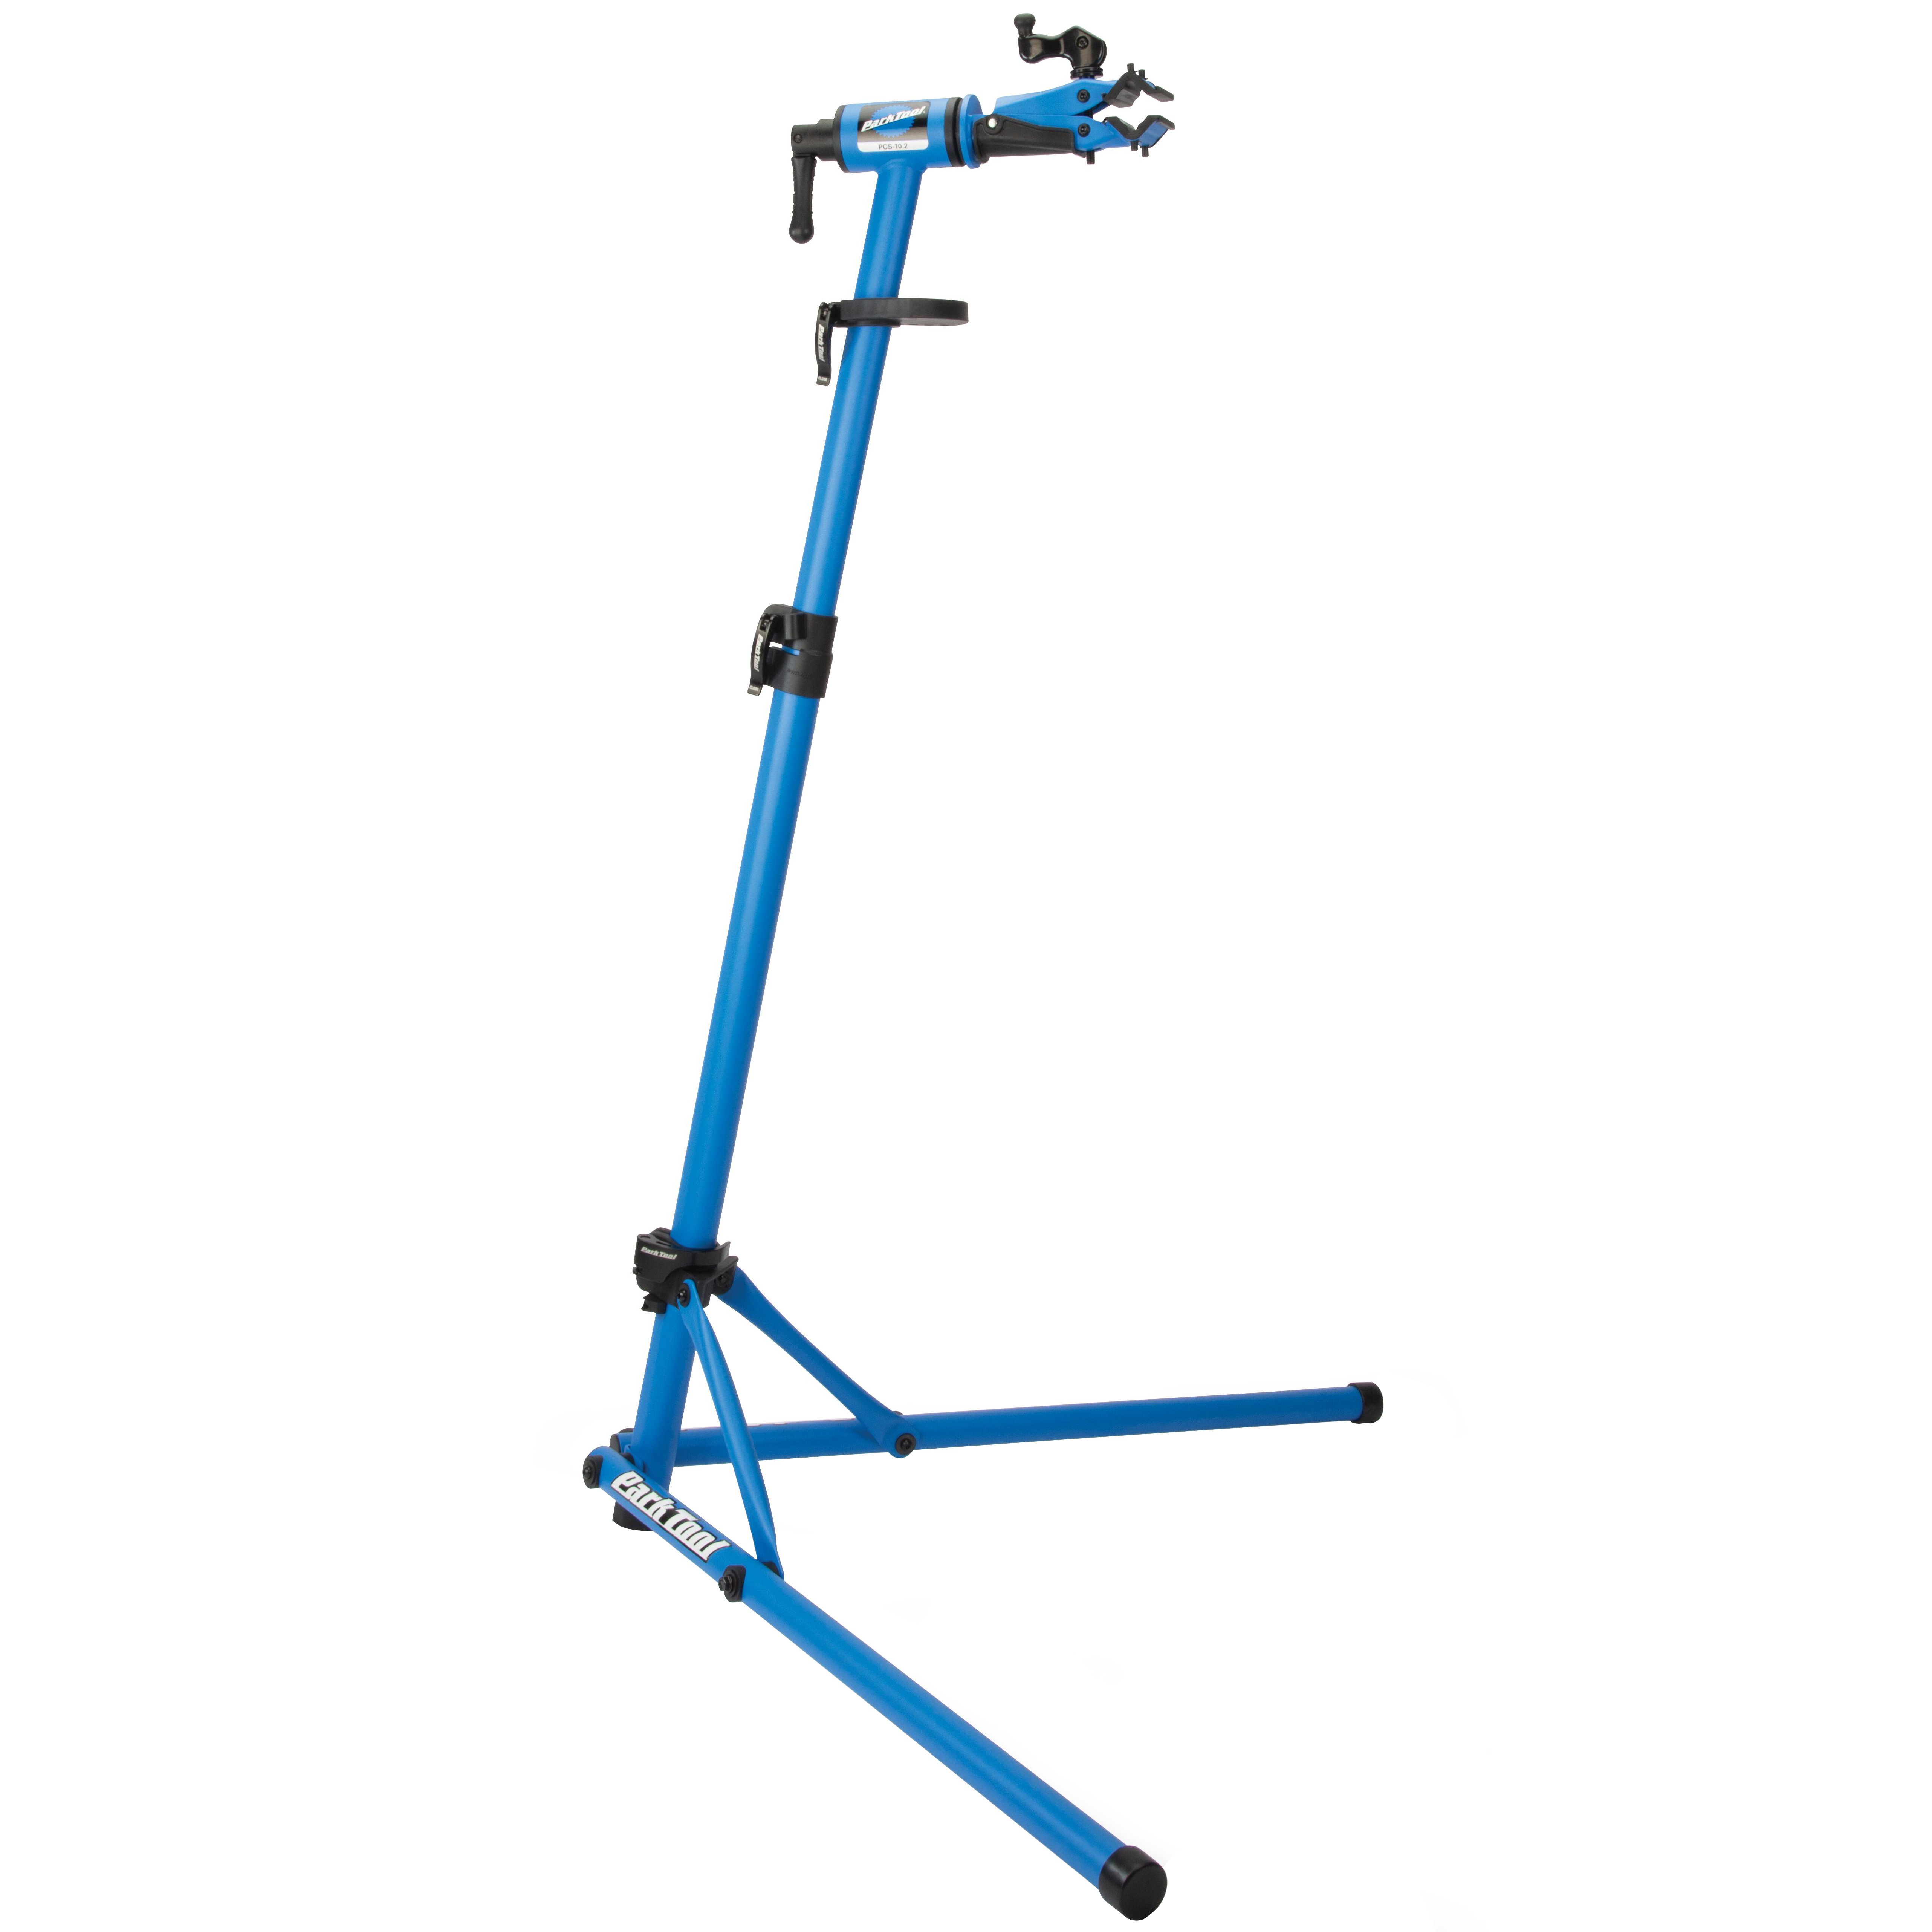 Stupendous Park Tool Pcs 10 2 Home Repair Stand Machost Co Dining Chair Design Ideas Machostcouk